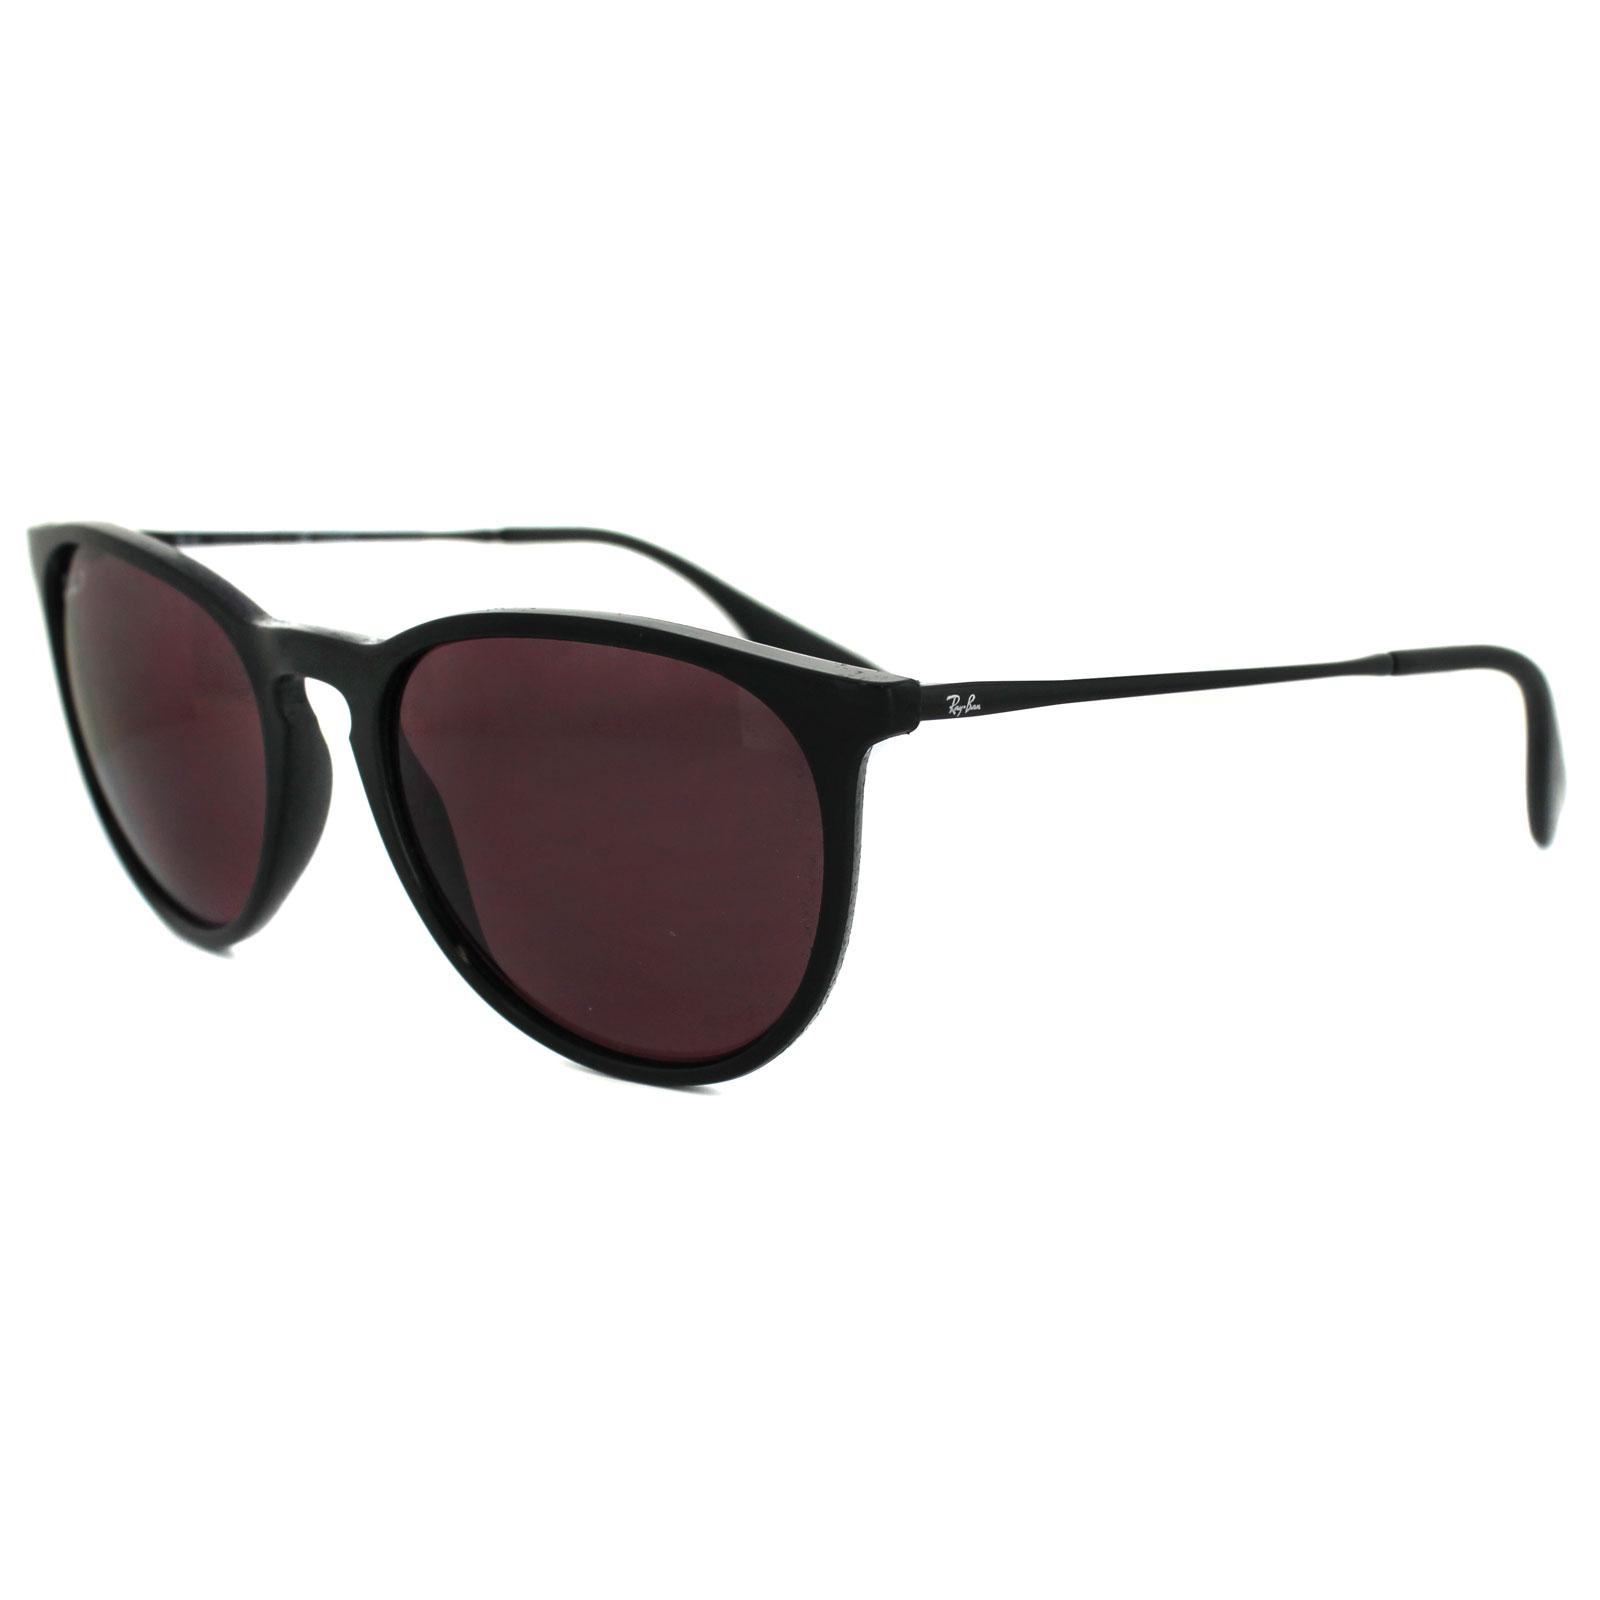 d712cbc6a4 Sentinel Ray-Ban Sunglasses Erika 4171 601 5Q Black Violet Mirror Polarized